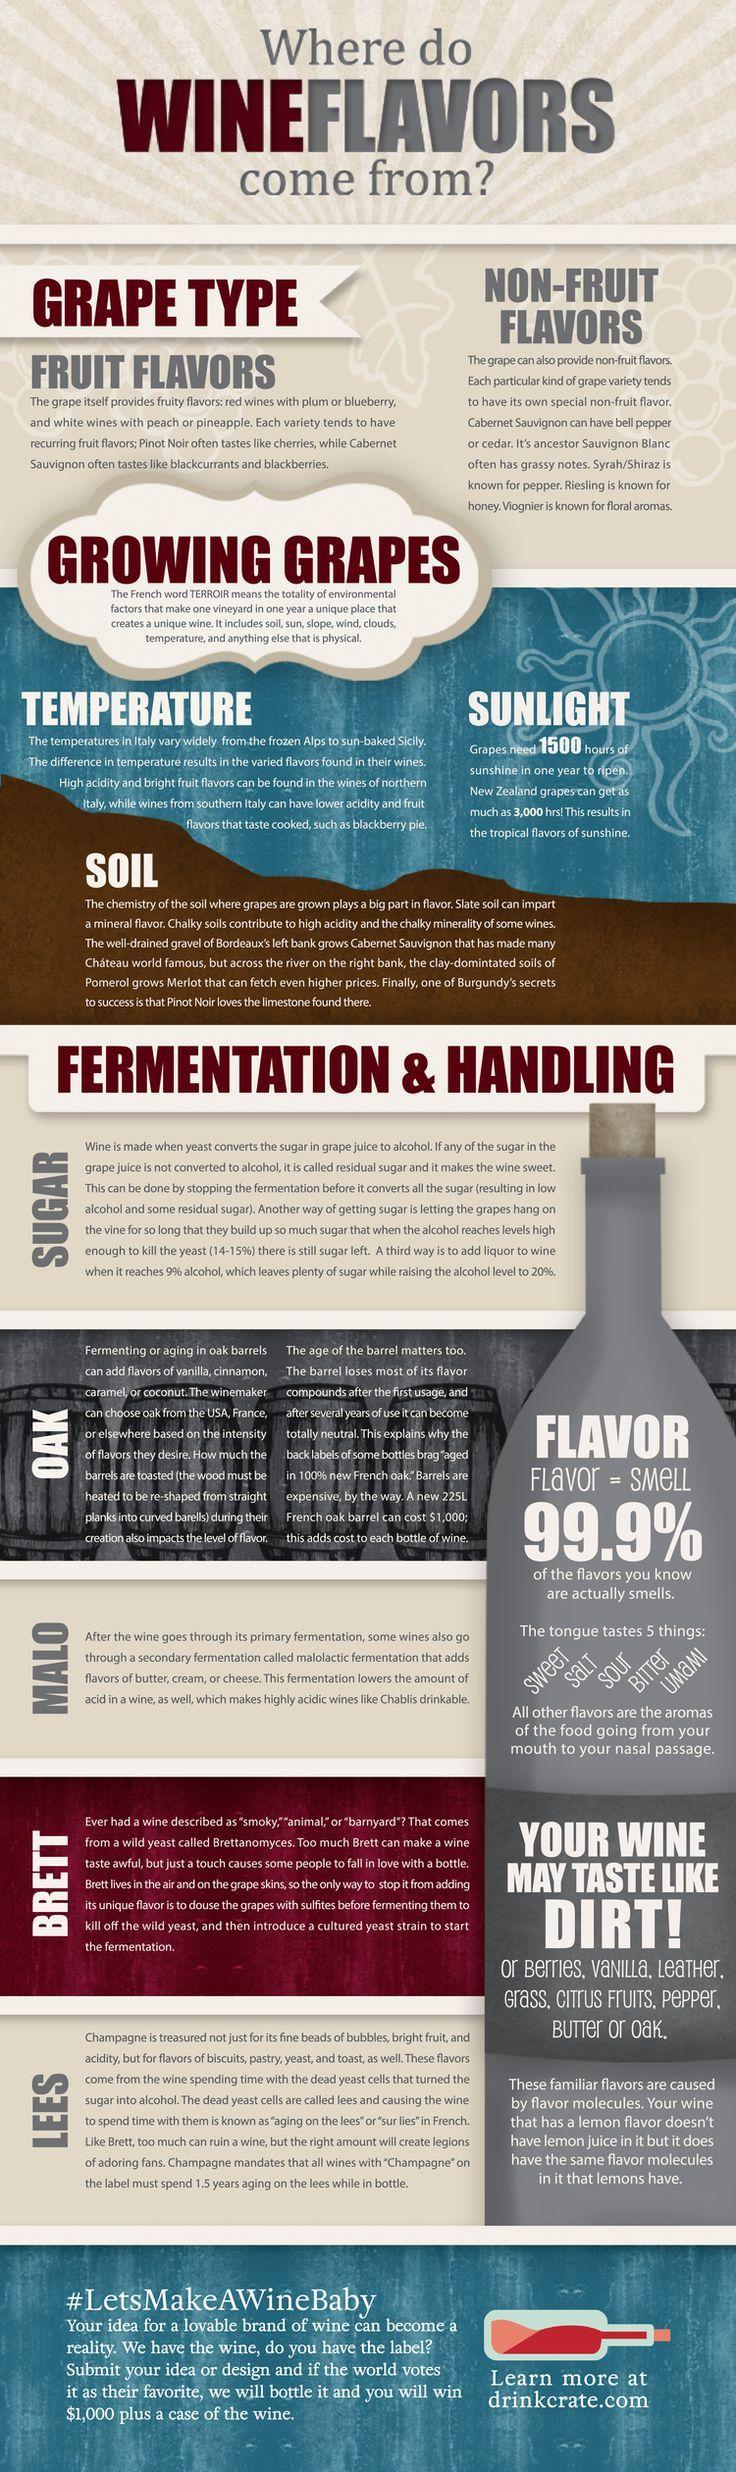 A handy little list here that spells out wine flavor origins.